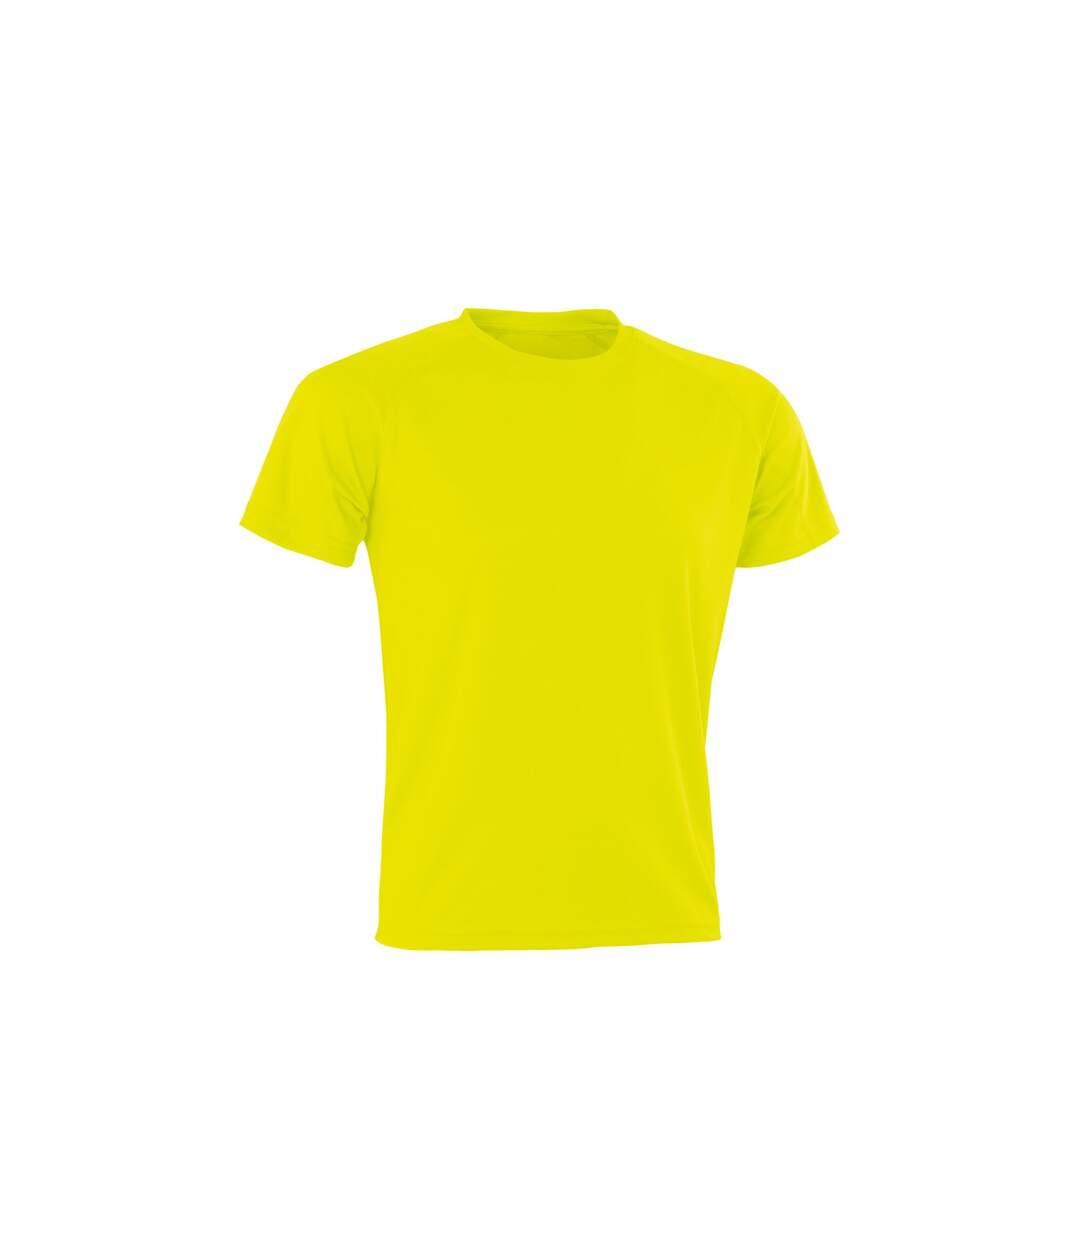 Spiro Mens Aircool T-Shirt (Flo Yellow) - UTPC3166